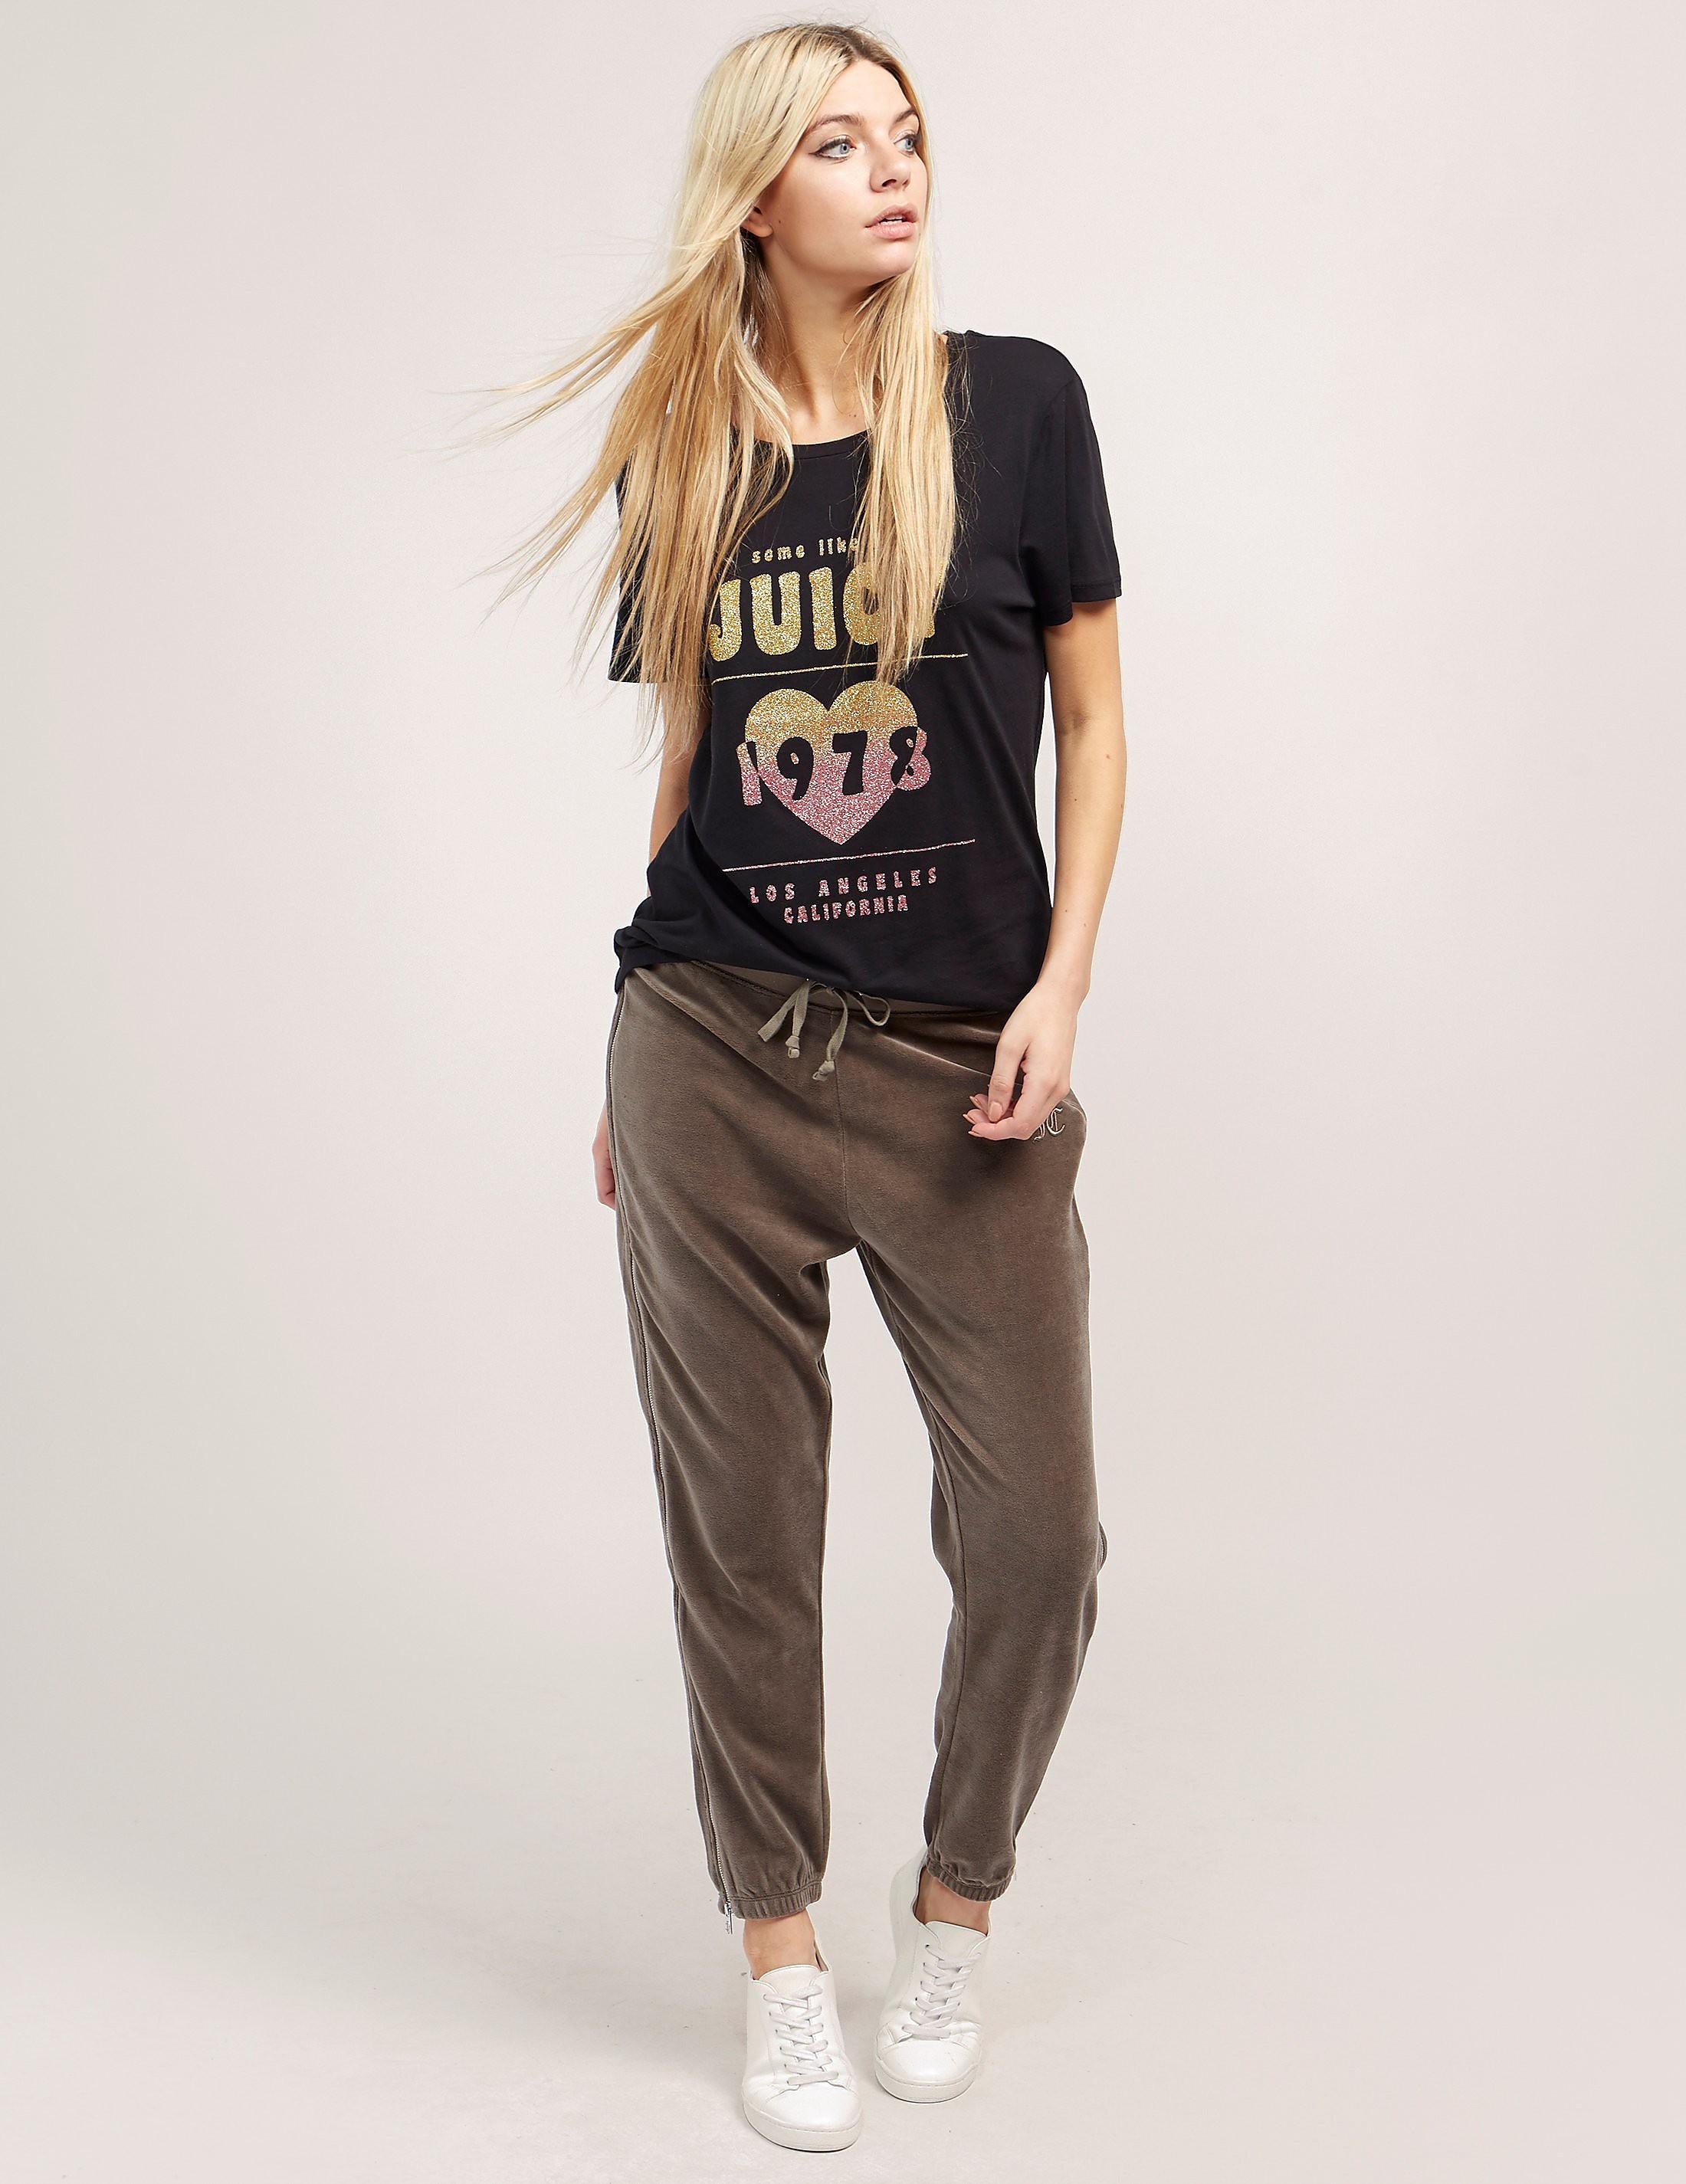 Juicy Couture Velour Zip Pant